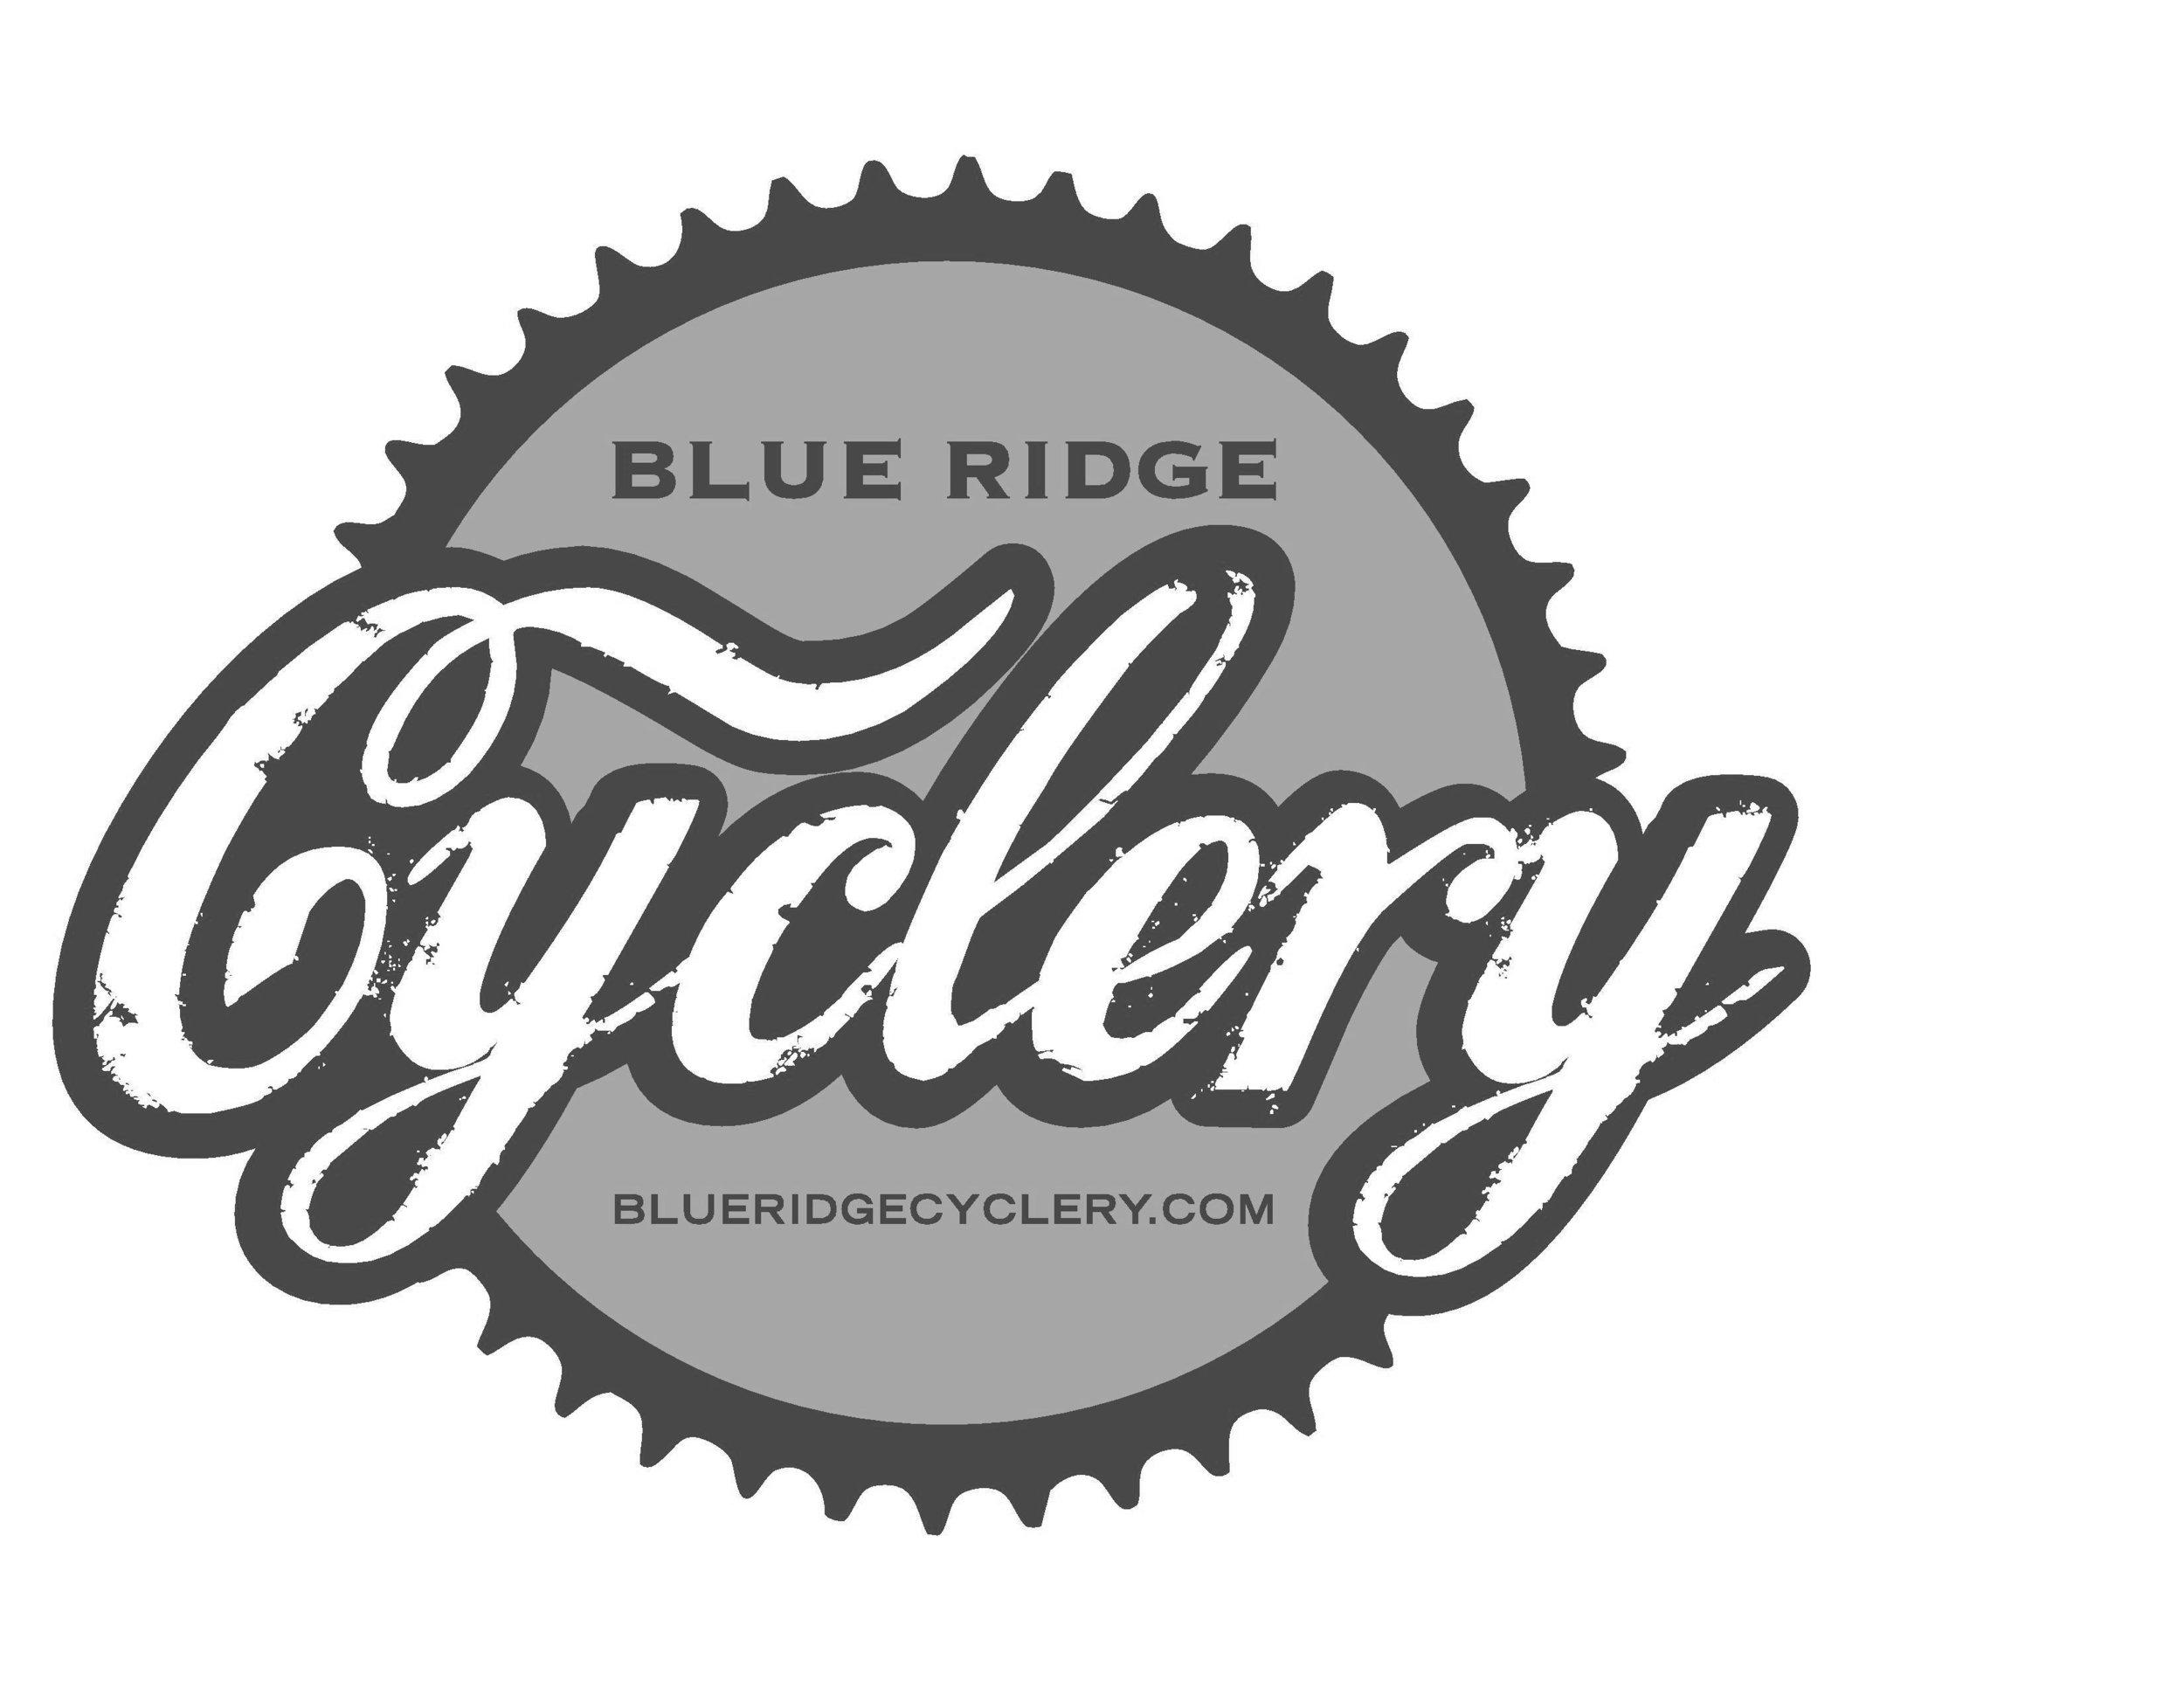 Blue Ridge Cyclery - Pursue the Podium